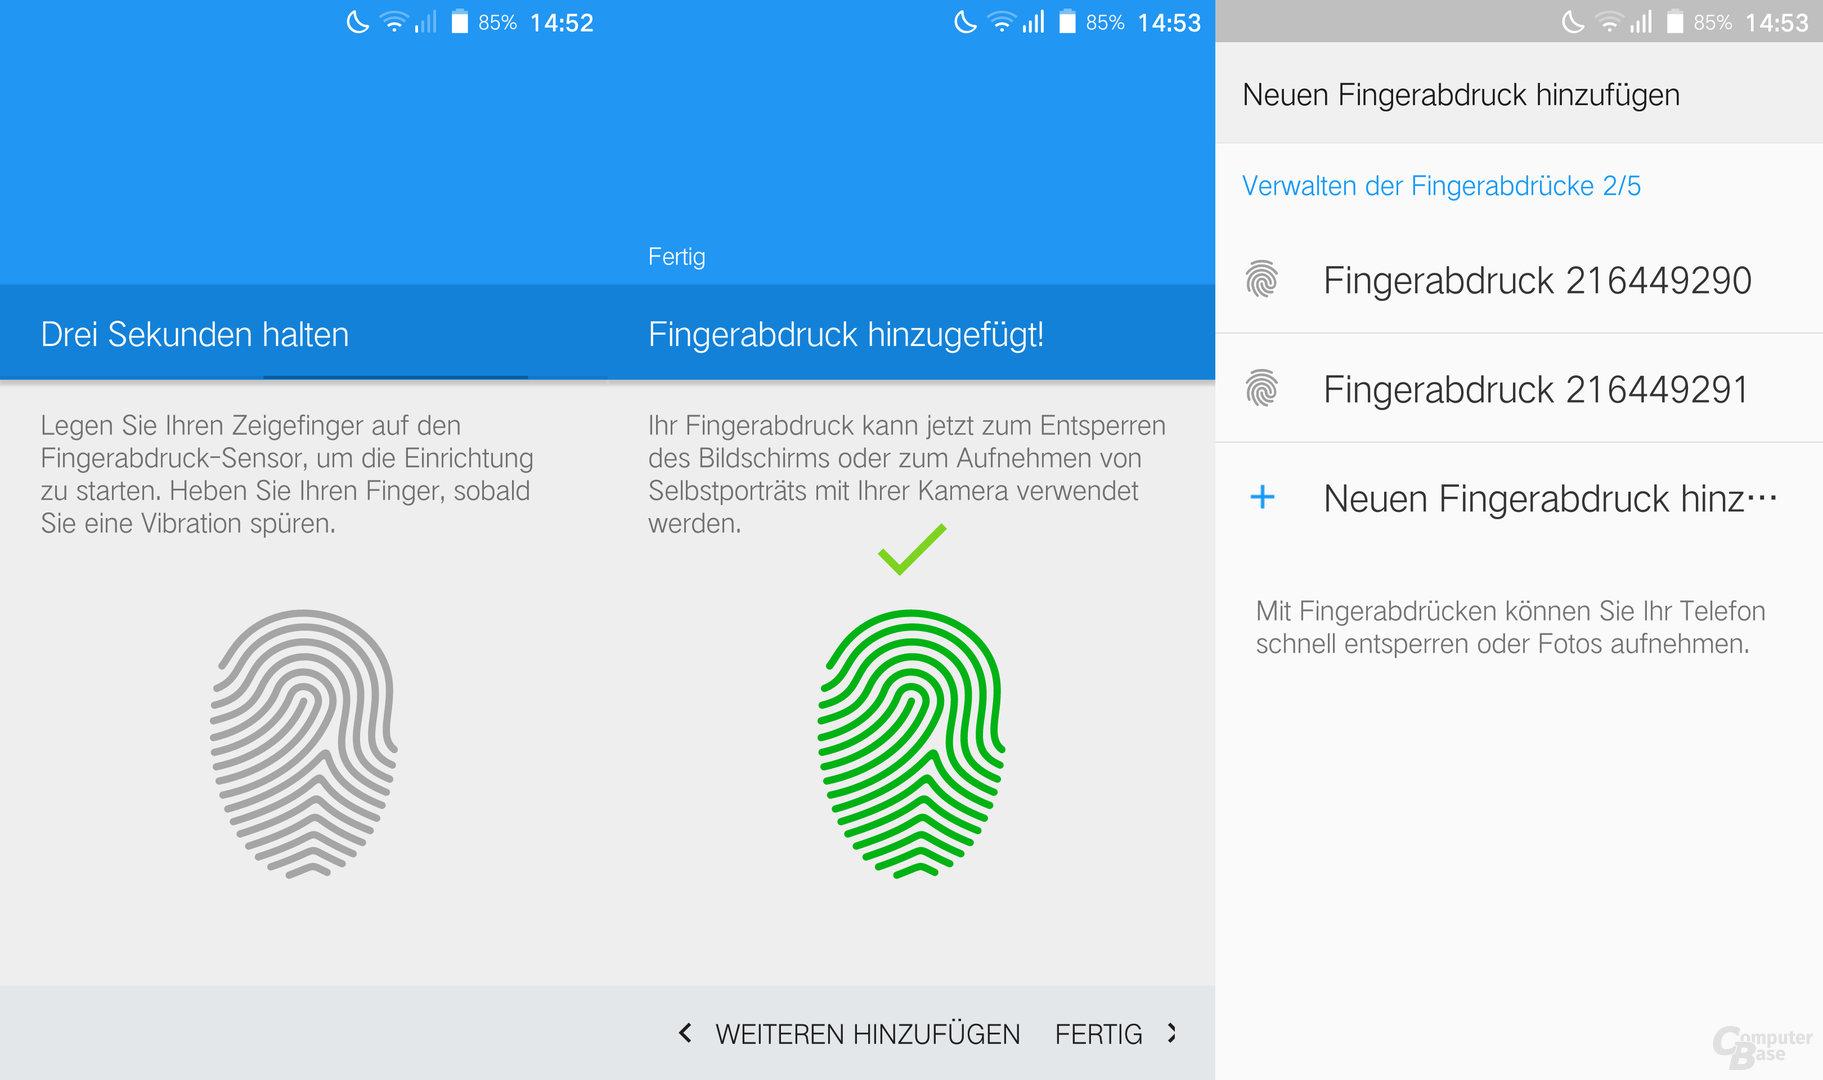 Fingerabdrucksensor einrichten